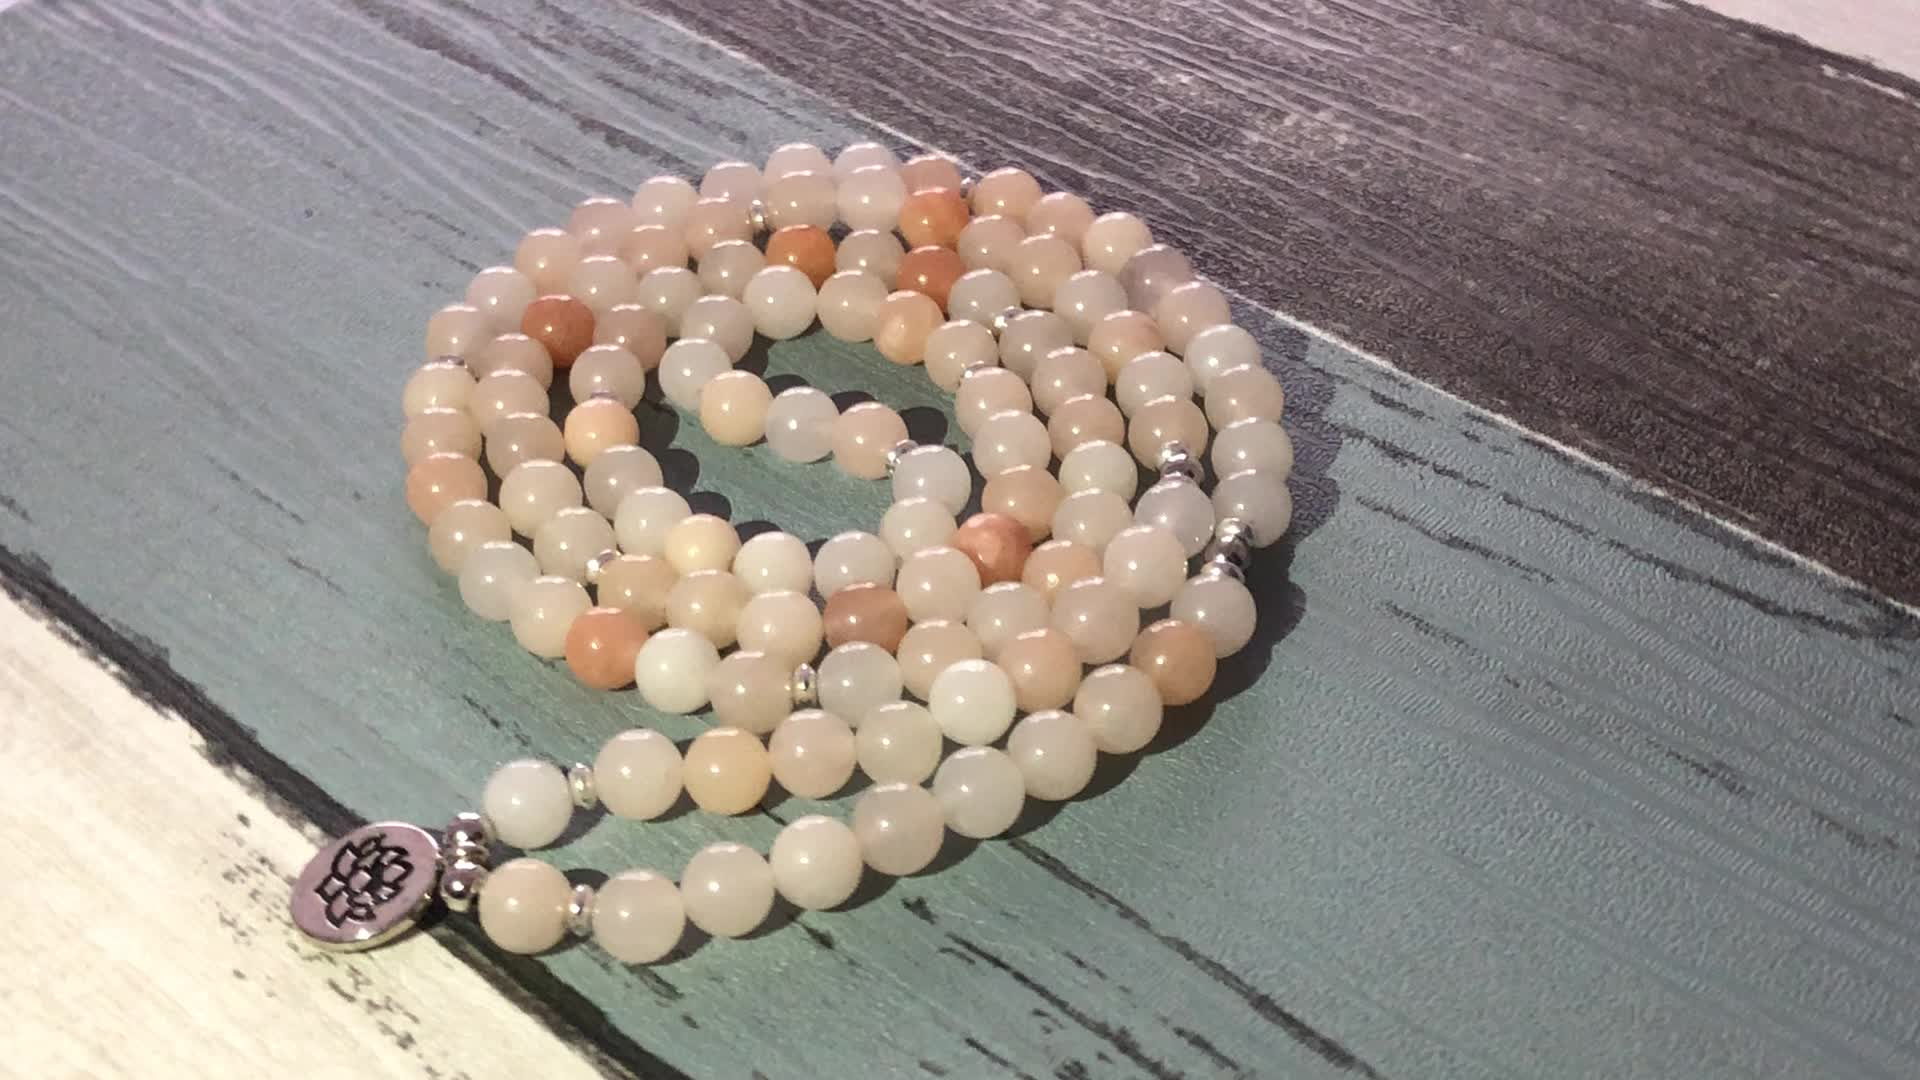 SN1491 STONE OF POWER 108 Mala Bead Bracelet Yoga Budhhist Jewelry Meditation Yoga Prayer Beads Bracelet Or Necklace